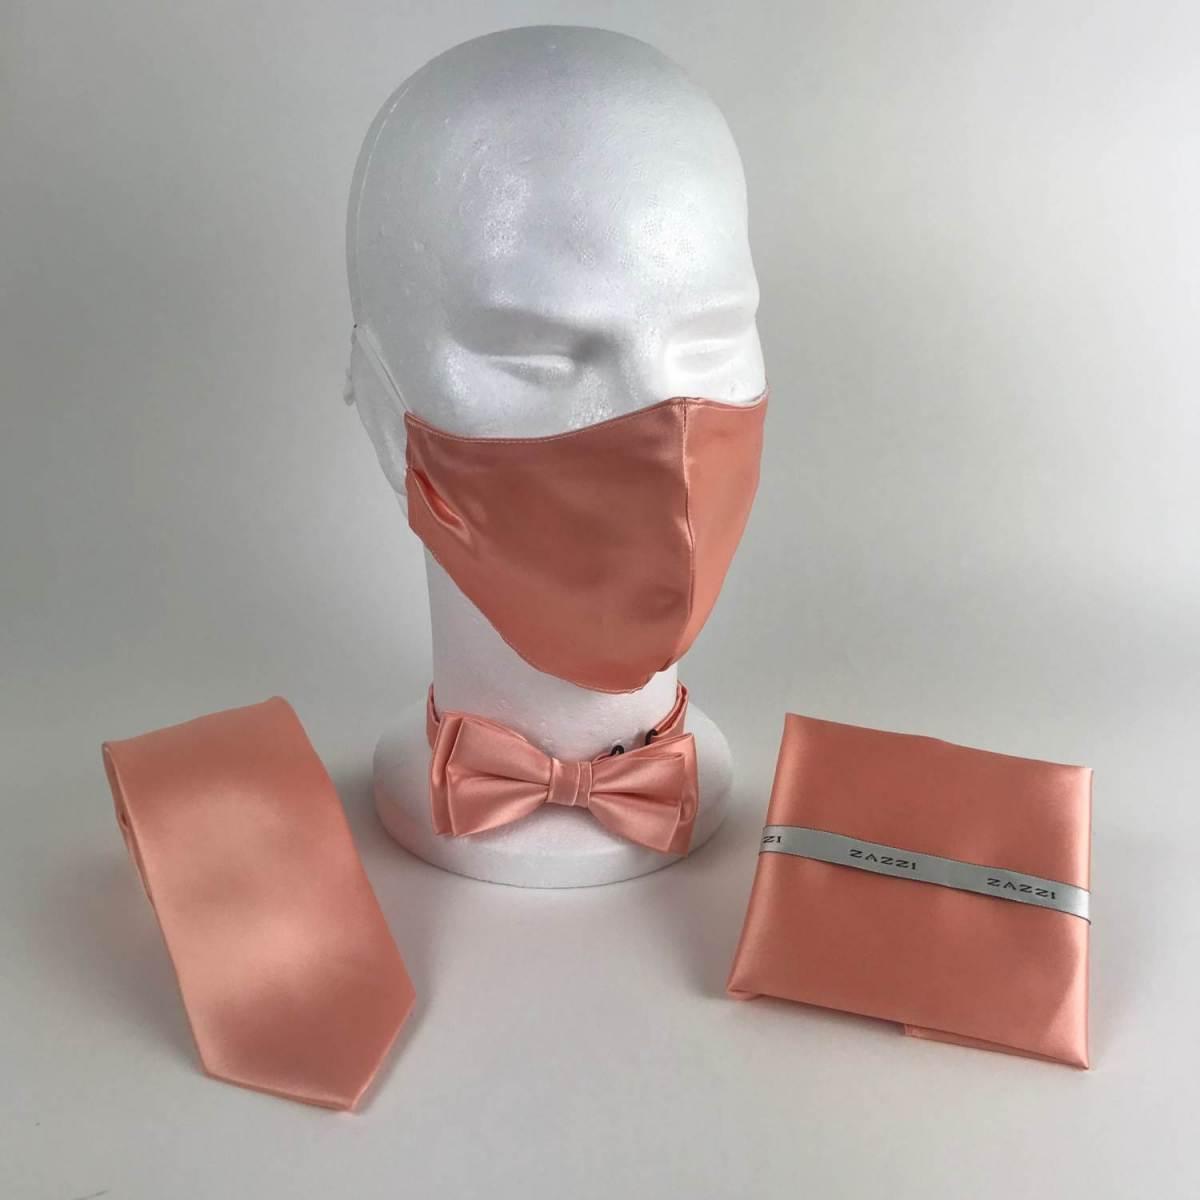 B1764 19 Peach FM. mens ties facemasks con murphys menswear cork scaled - - Con Murphys Menswear